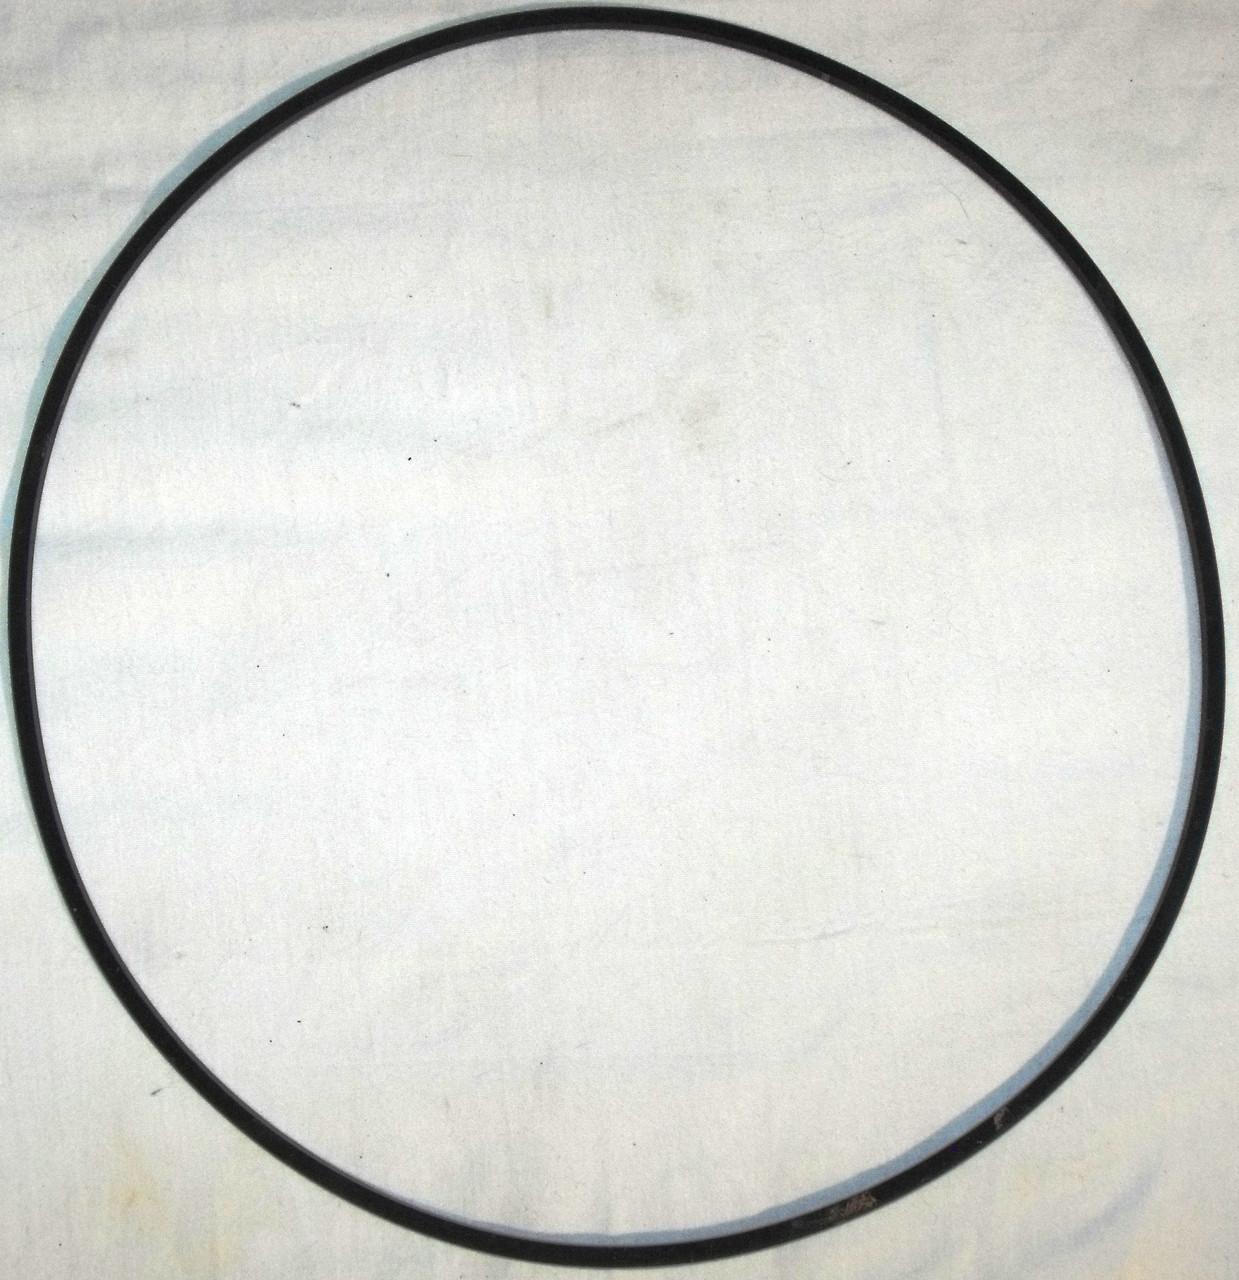 4l60 tcc solenoid wiring diagram wire 2 [ 1239 x 1280 Pixel ]